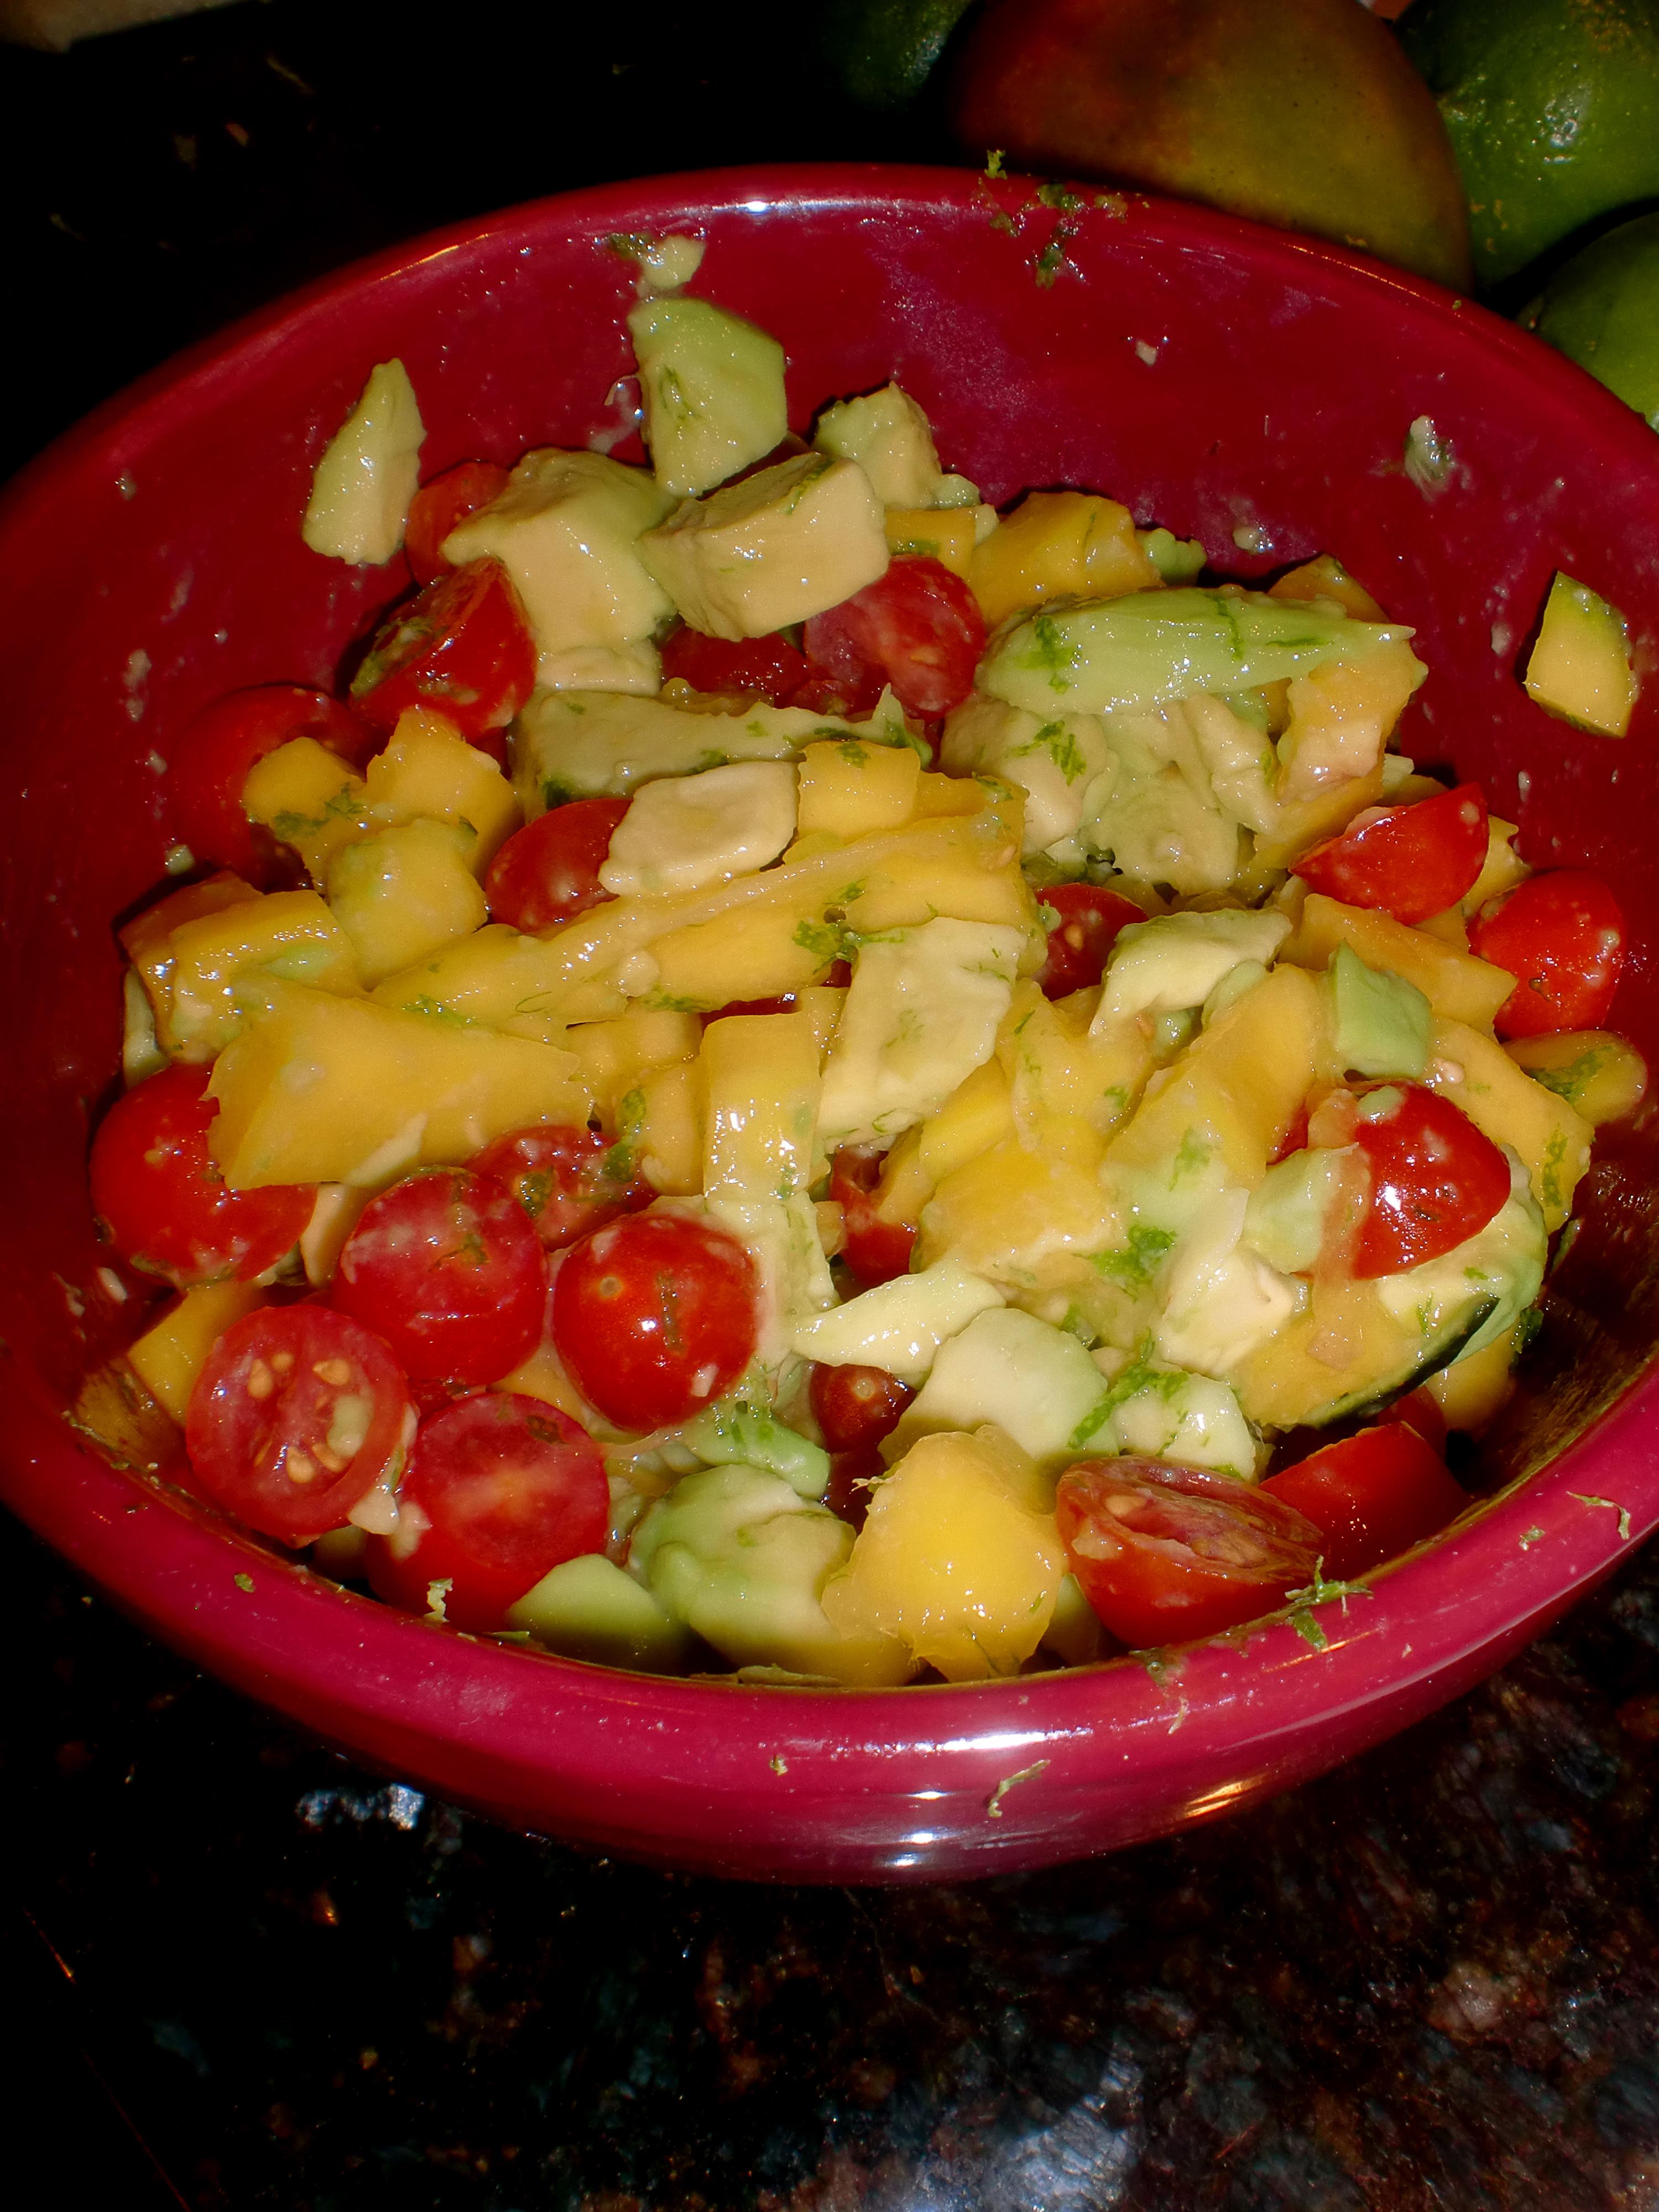 Grilled Tilapia with Mango-Avocado Salsa.